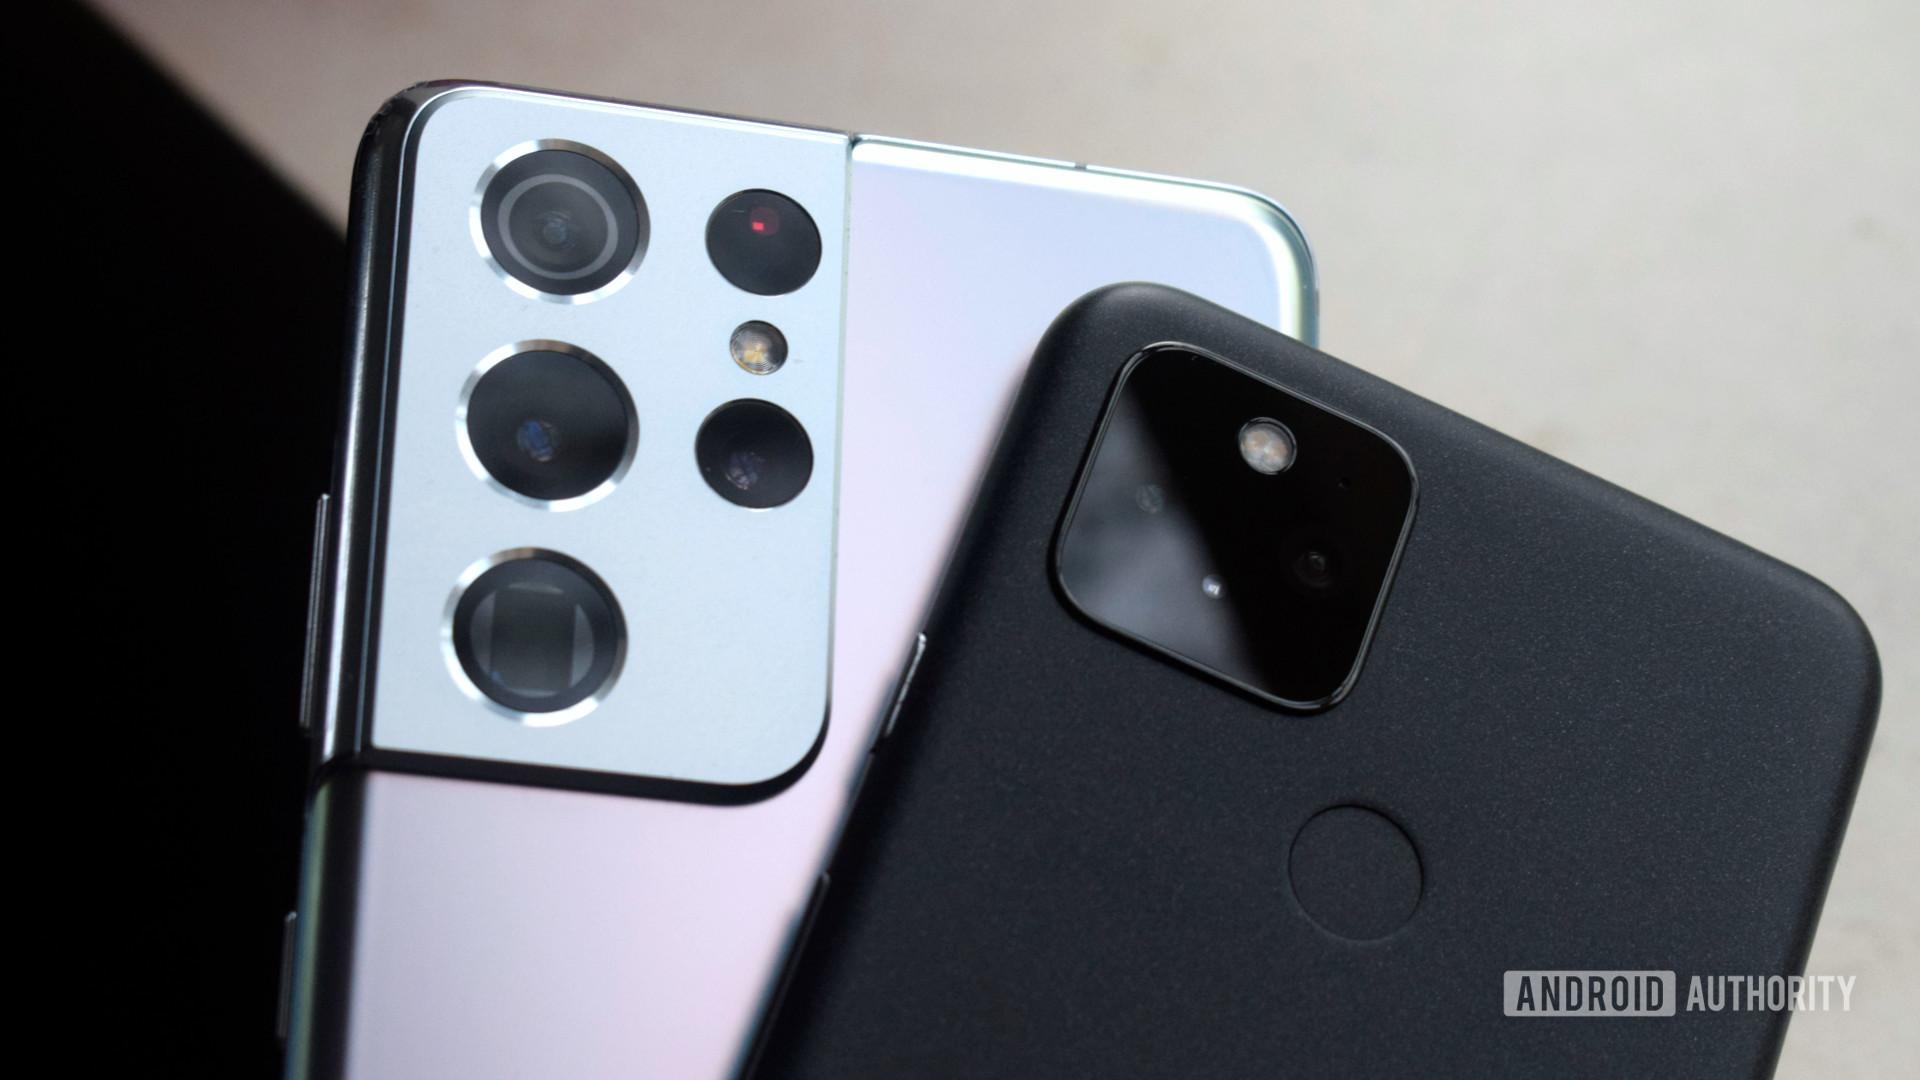 Galaxy S21 Ultra vs Pixel 5 camera